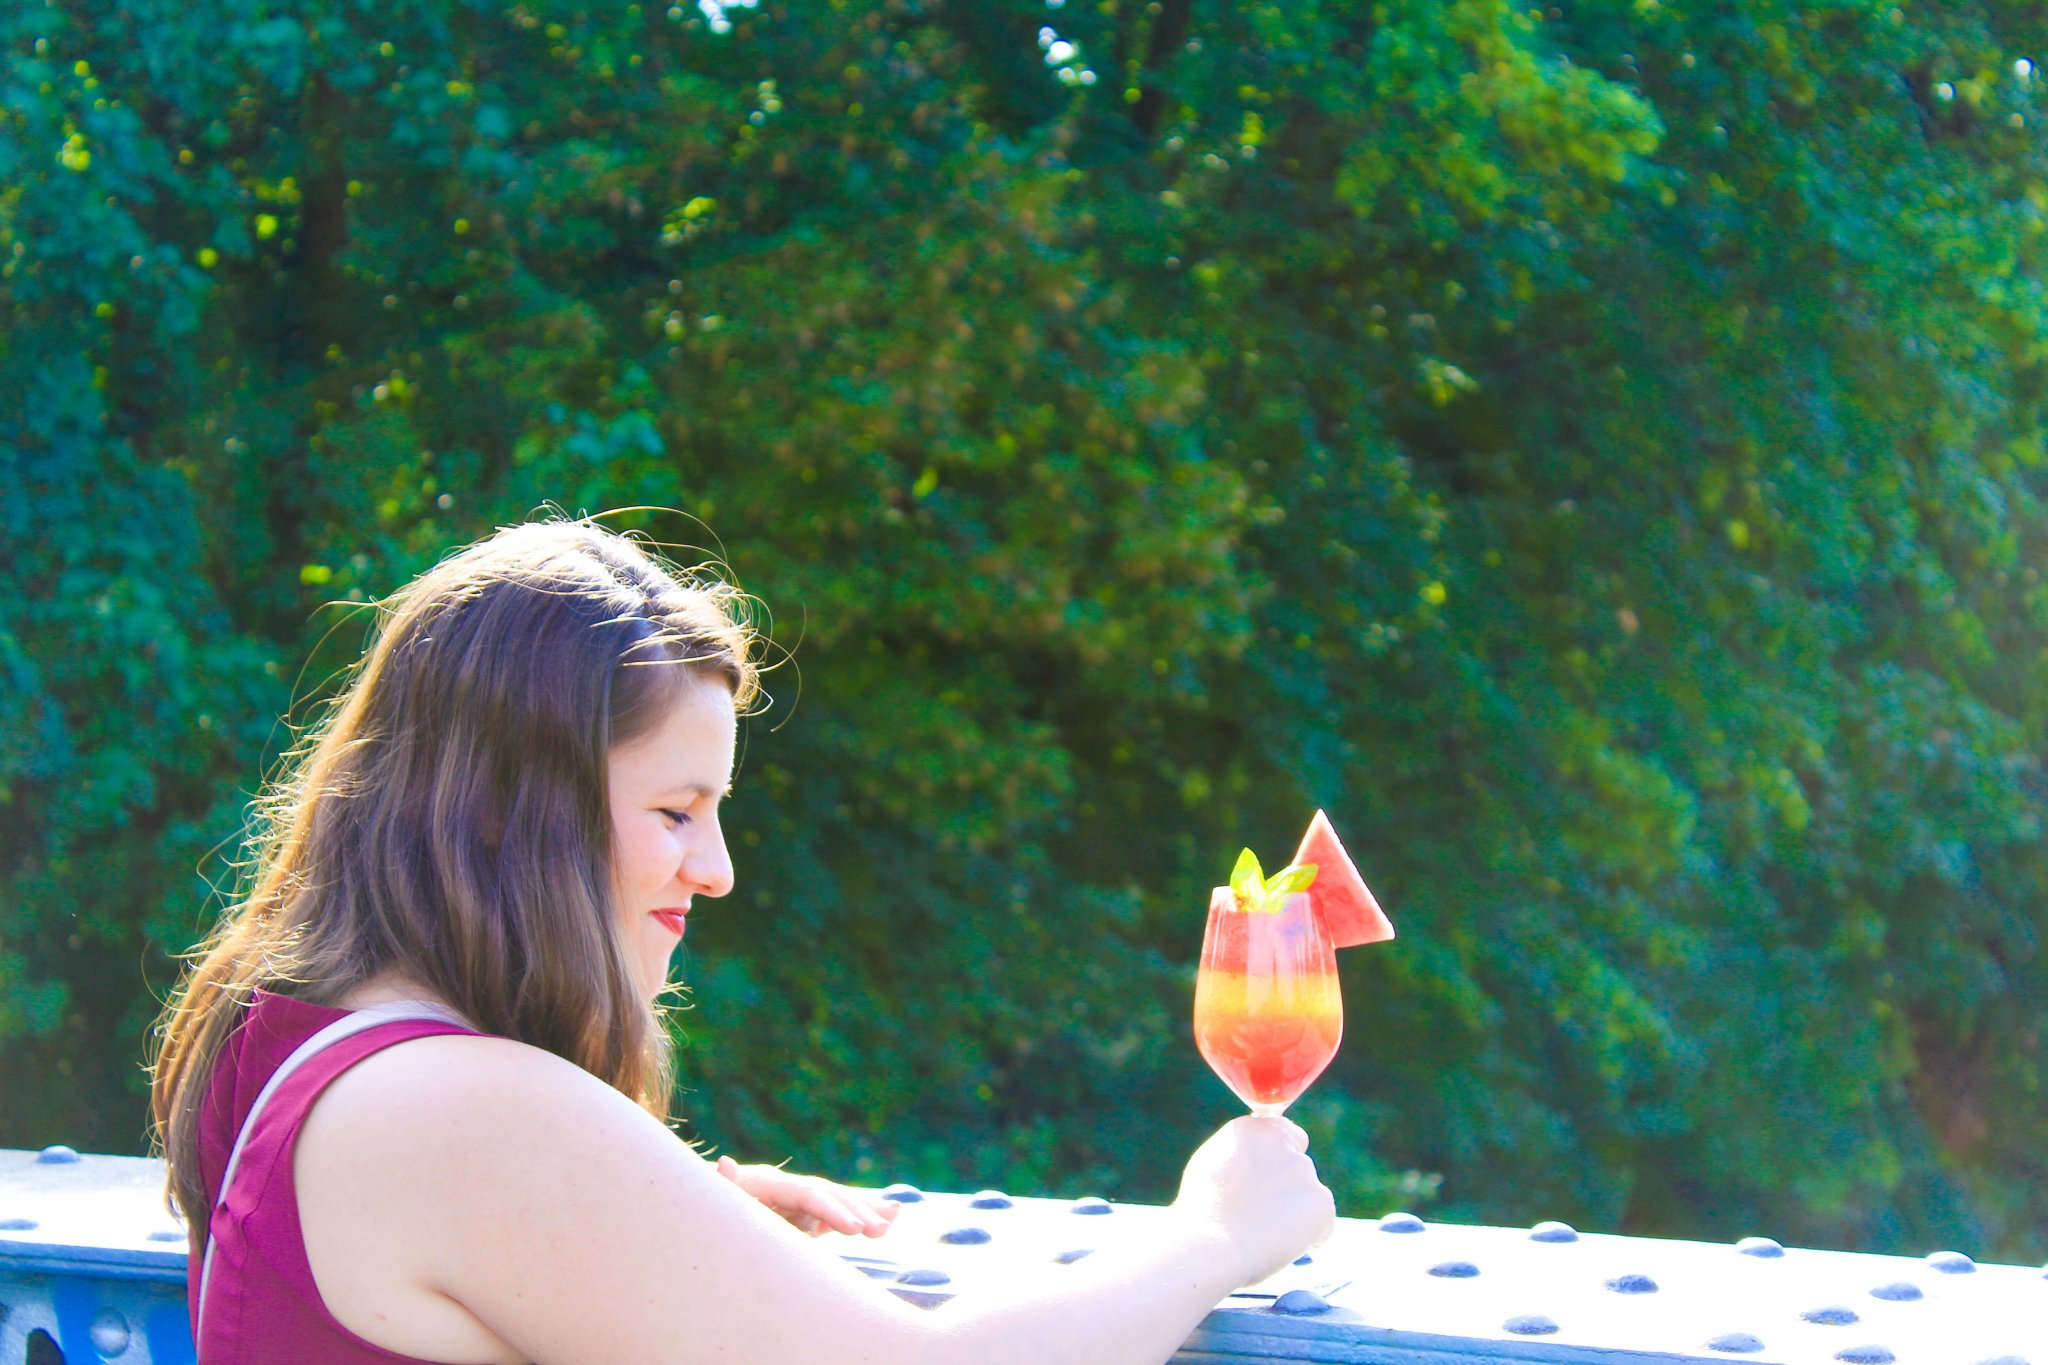 Anzeige: Melonen-Basilikum-Prosecco mit silwy magnetic drinkware